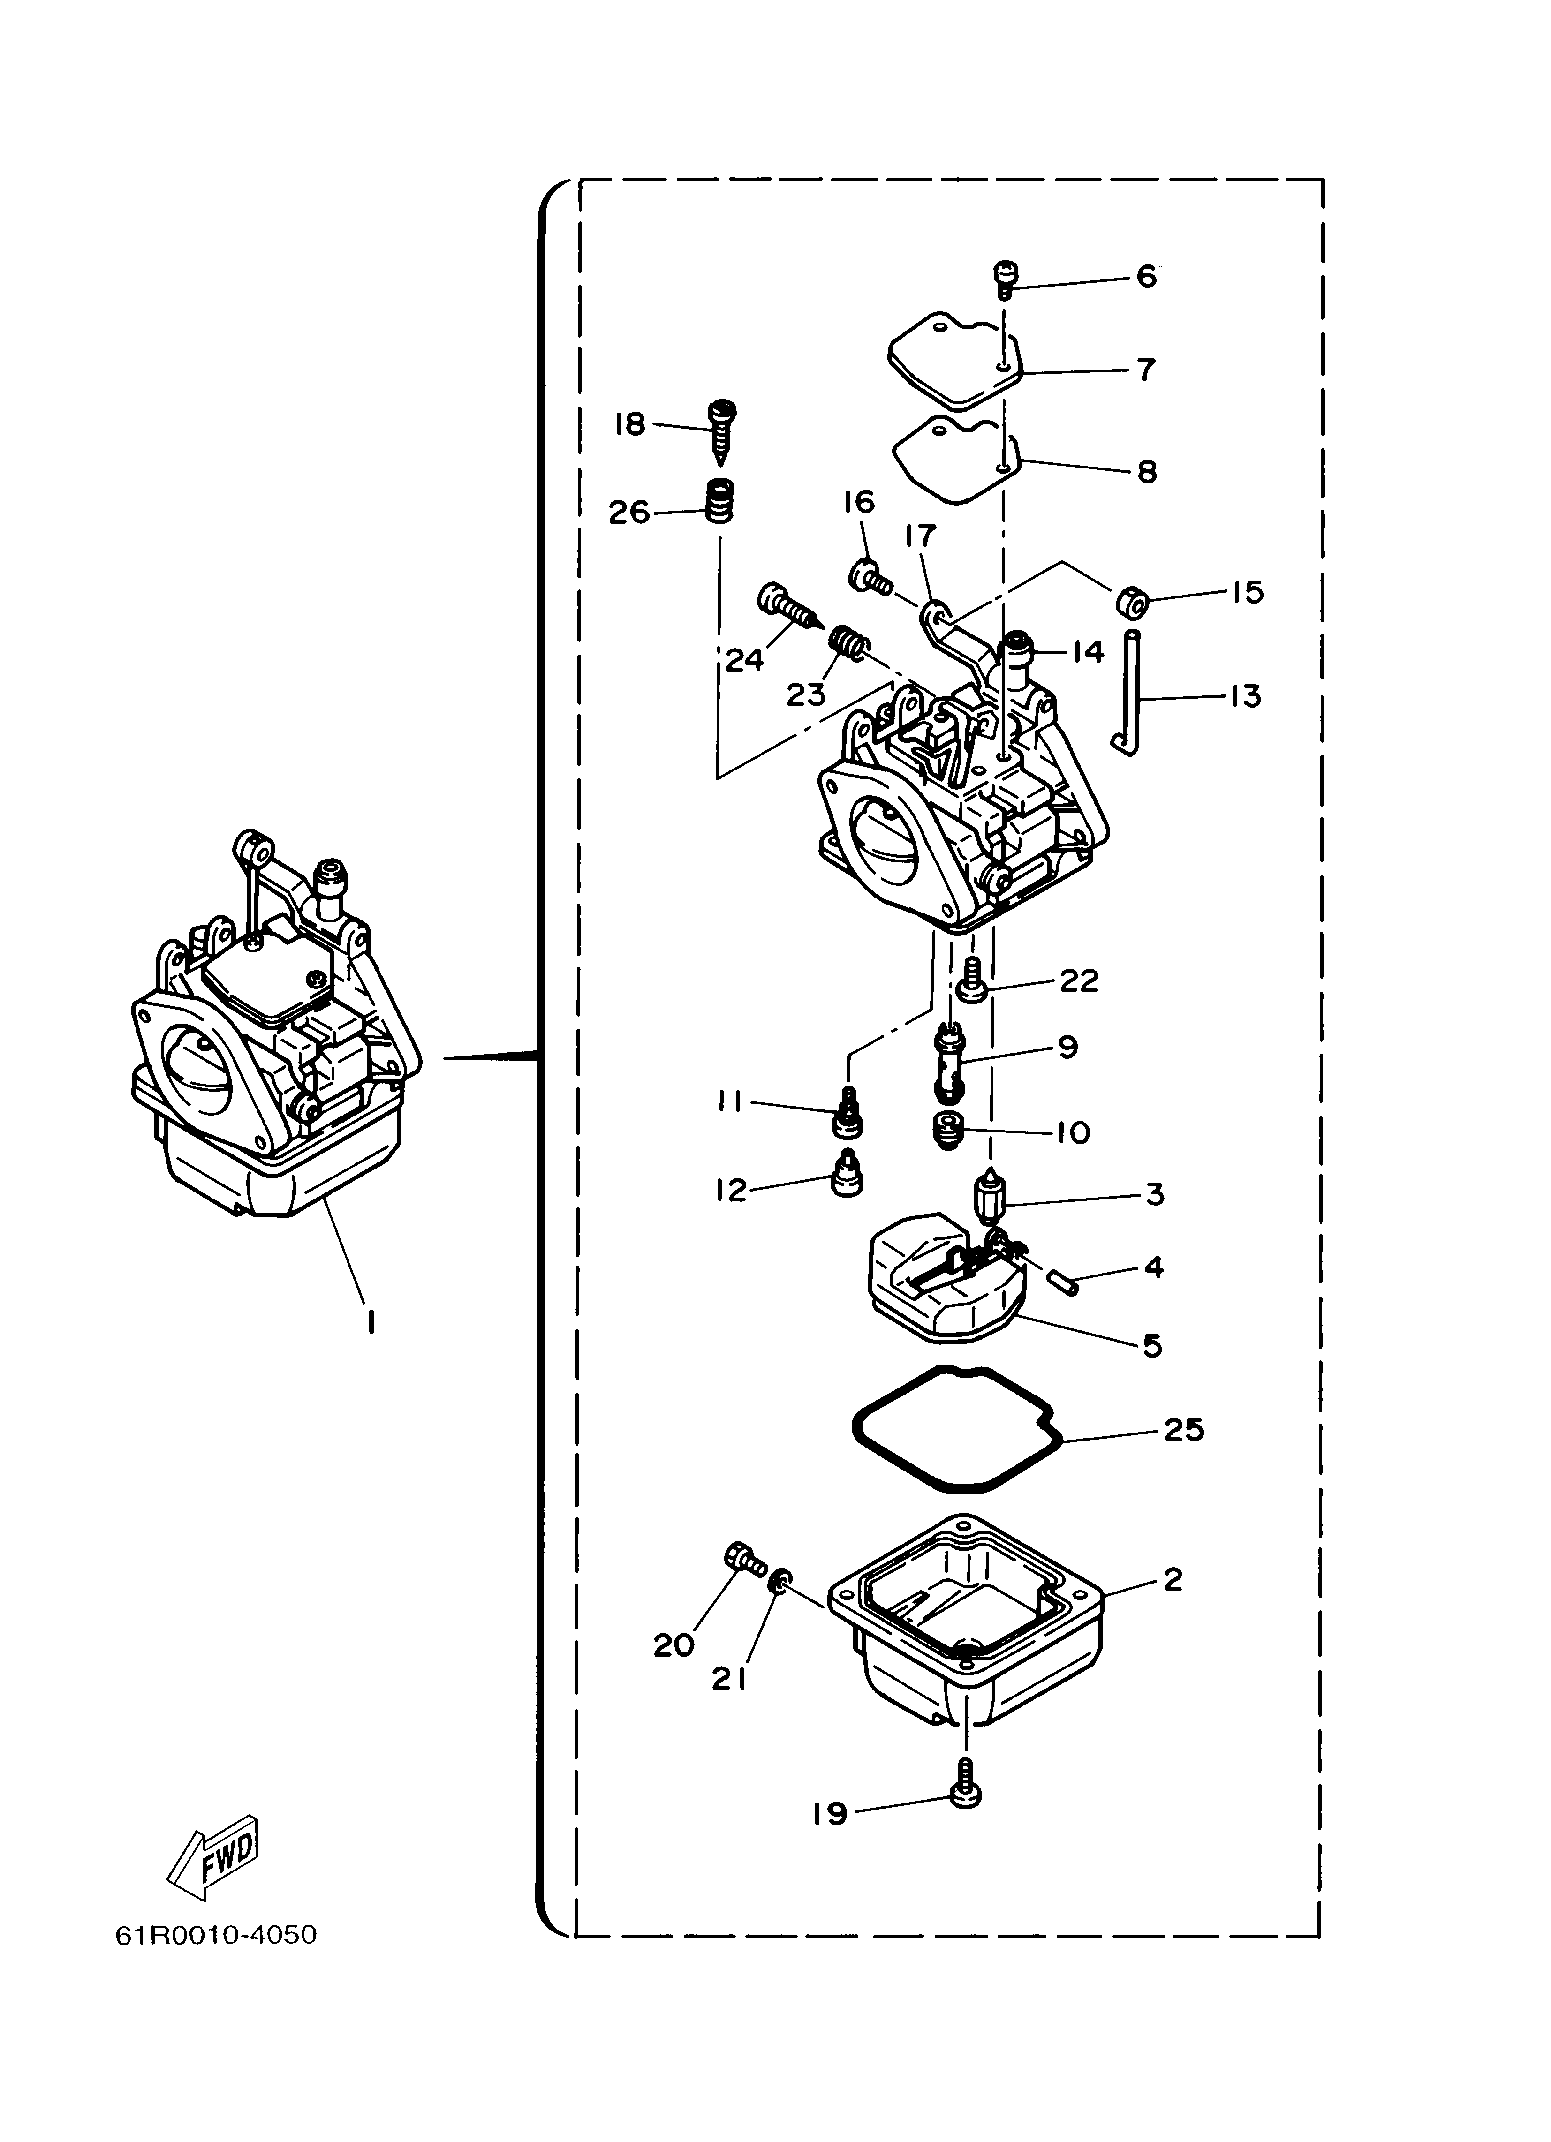 1997 dodge dakota tach wiring diagram 04 neon radio tohatsu outboard best library mercury 110 9 8 hp 25